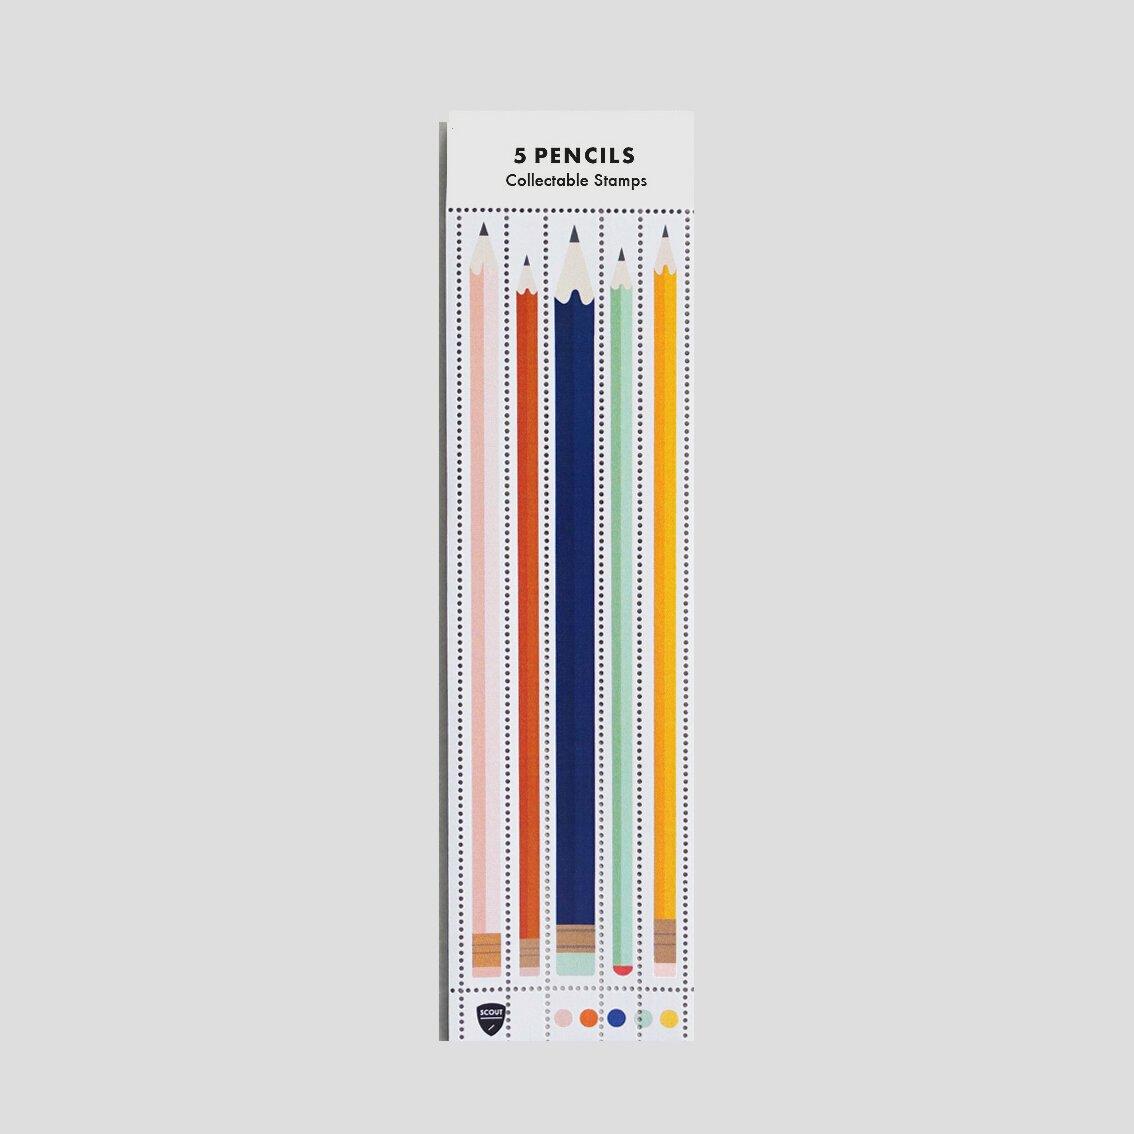 Image of Long Pencils Stamp Set